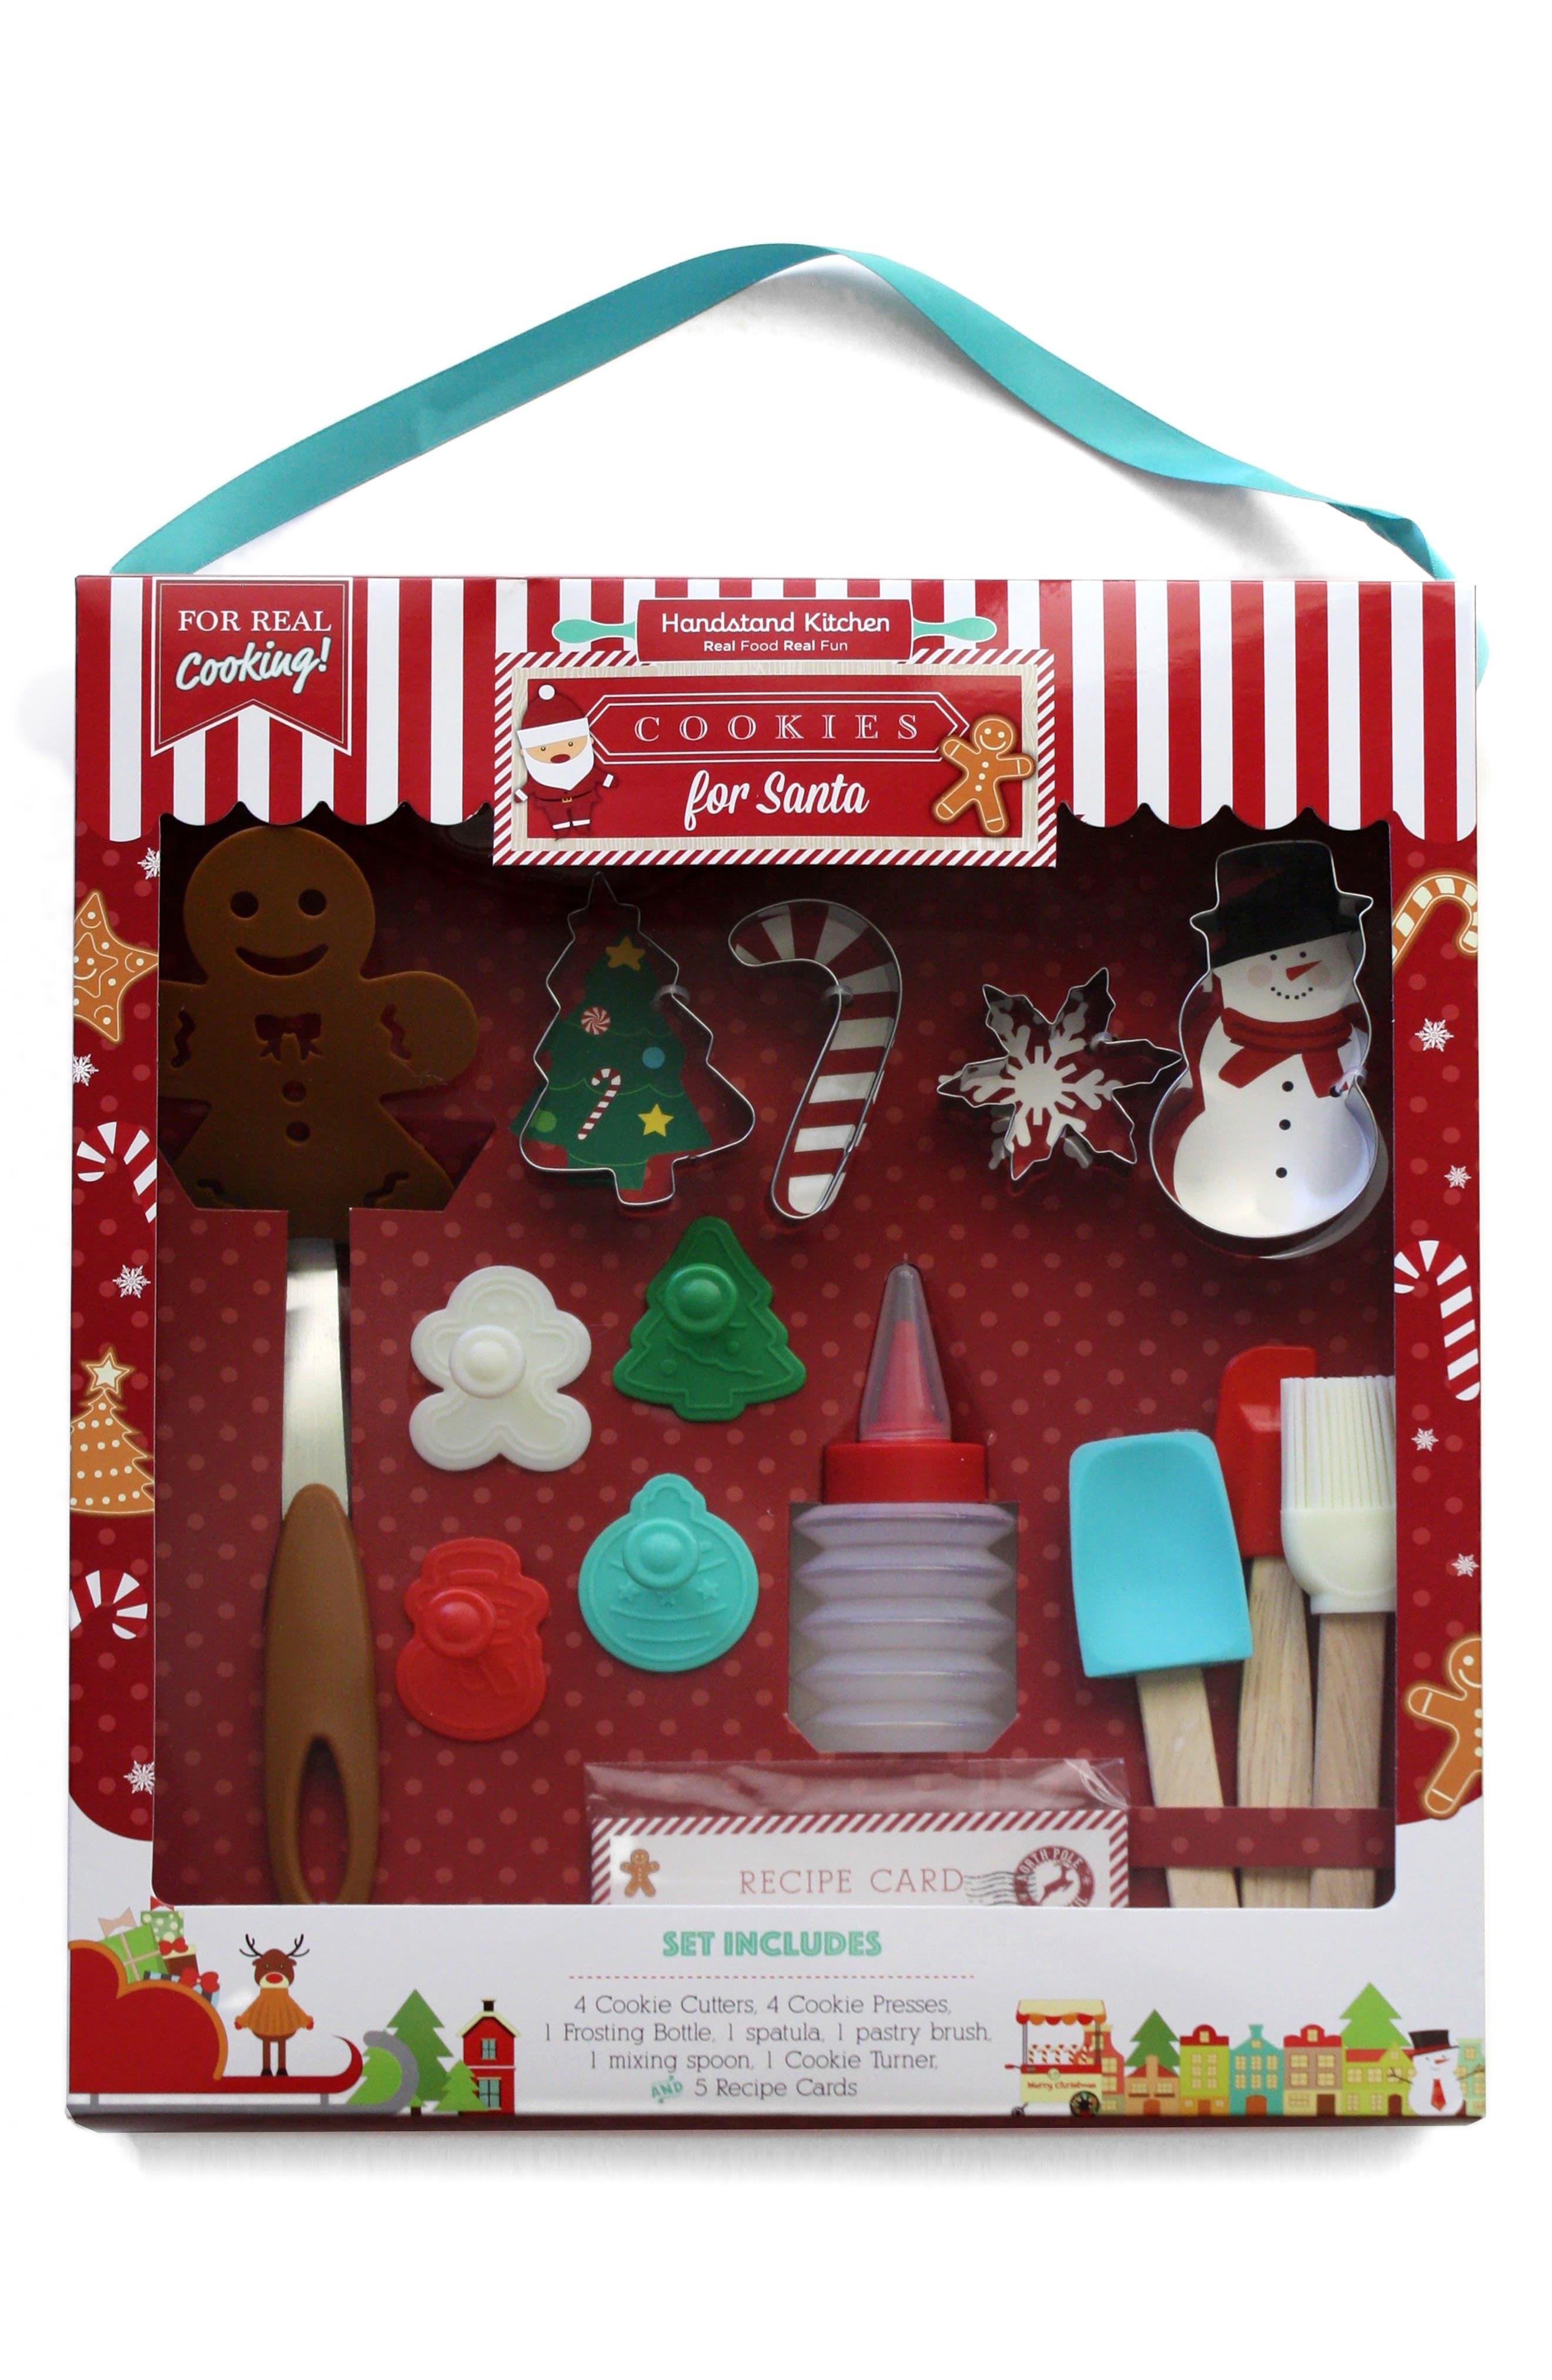 Handstand Kids Cookies for Santa Kit